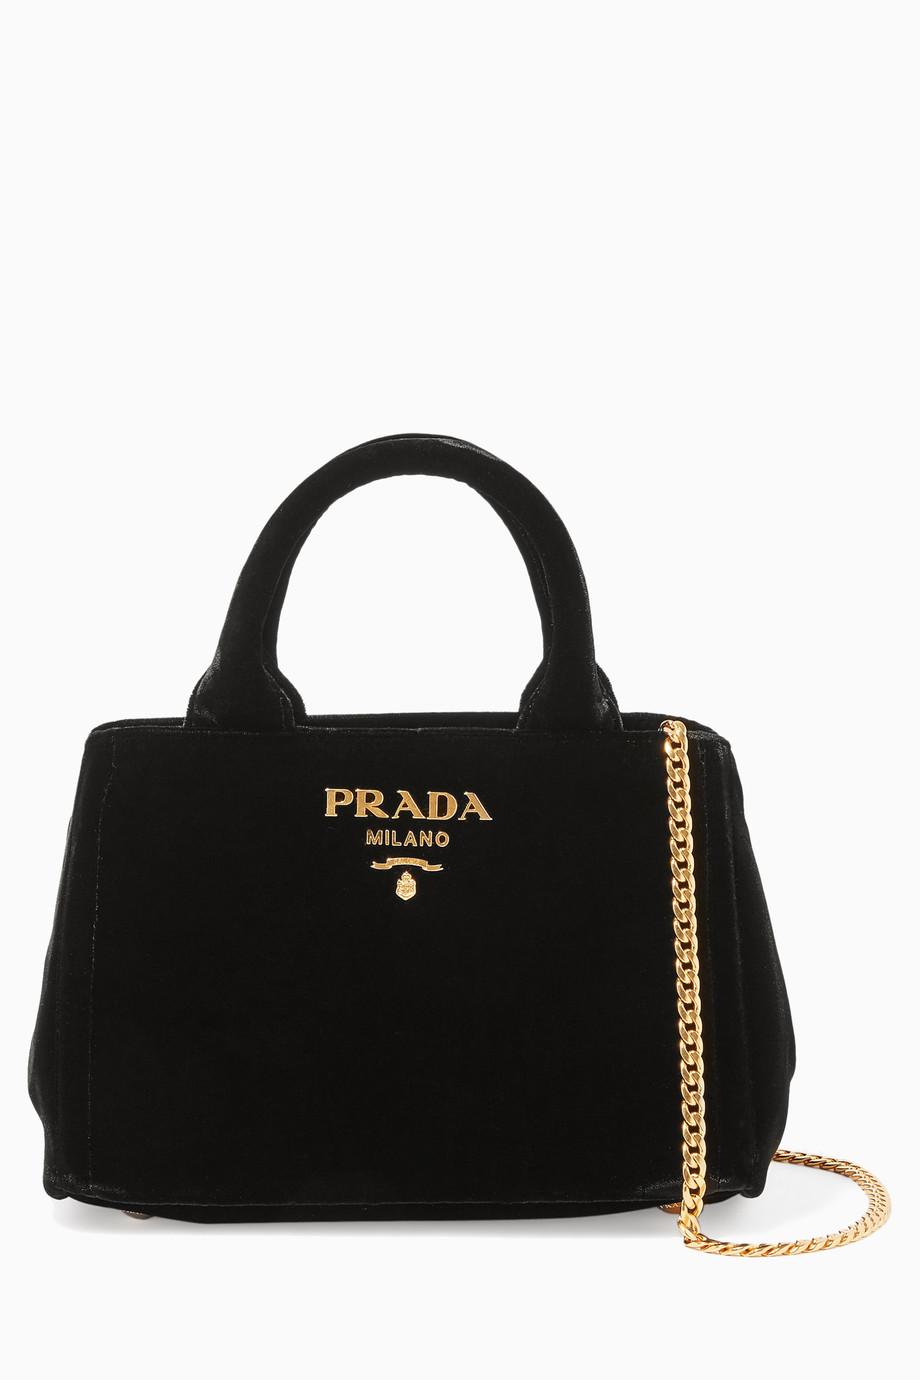 b8e8e1d34 تسوق حقيبة يد مخمل اسود ميني Prada أسود للنساء   اُناس السعودية